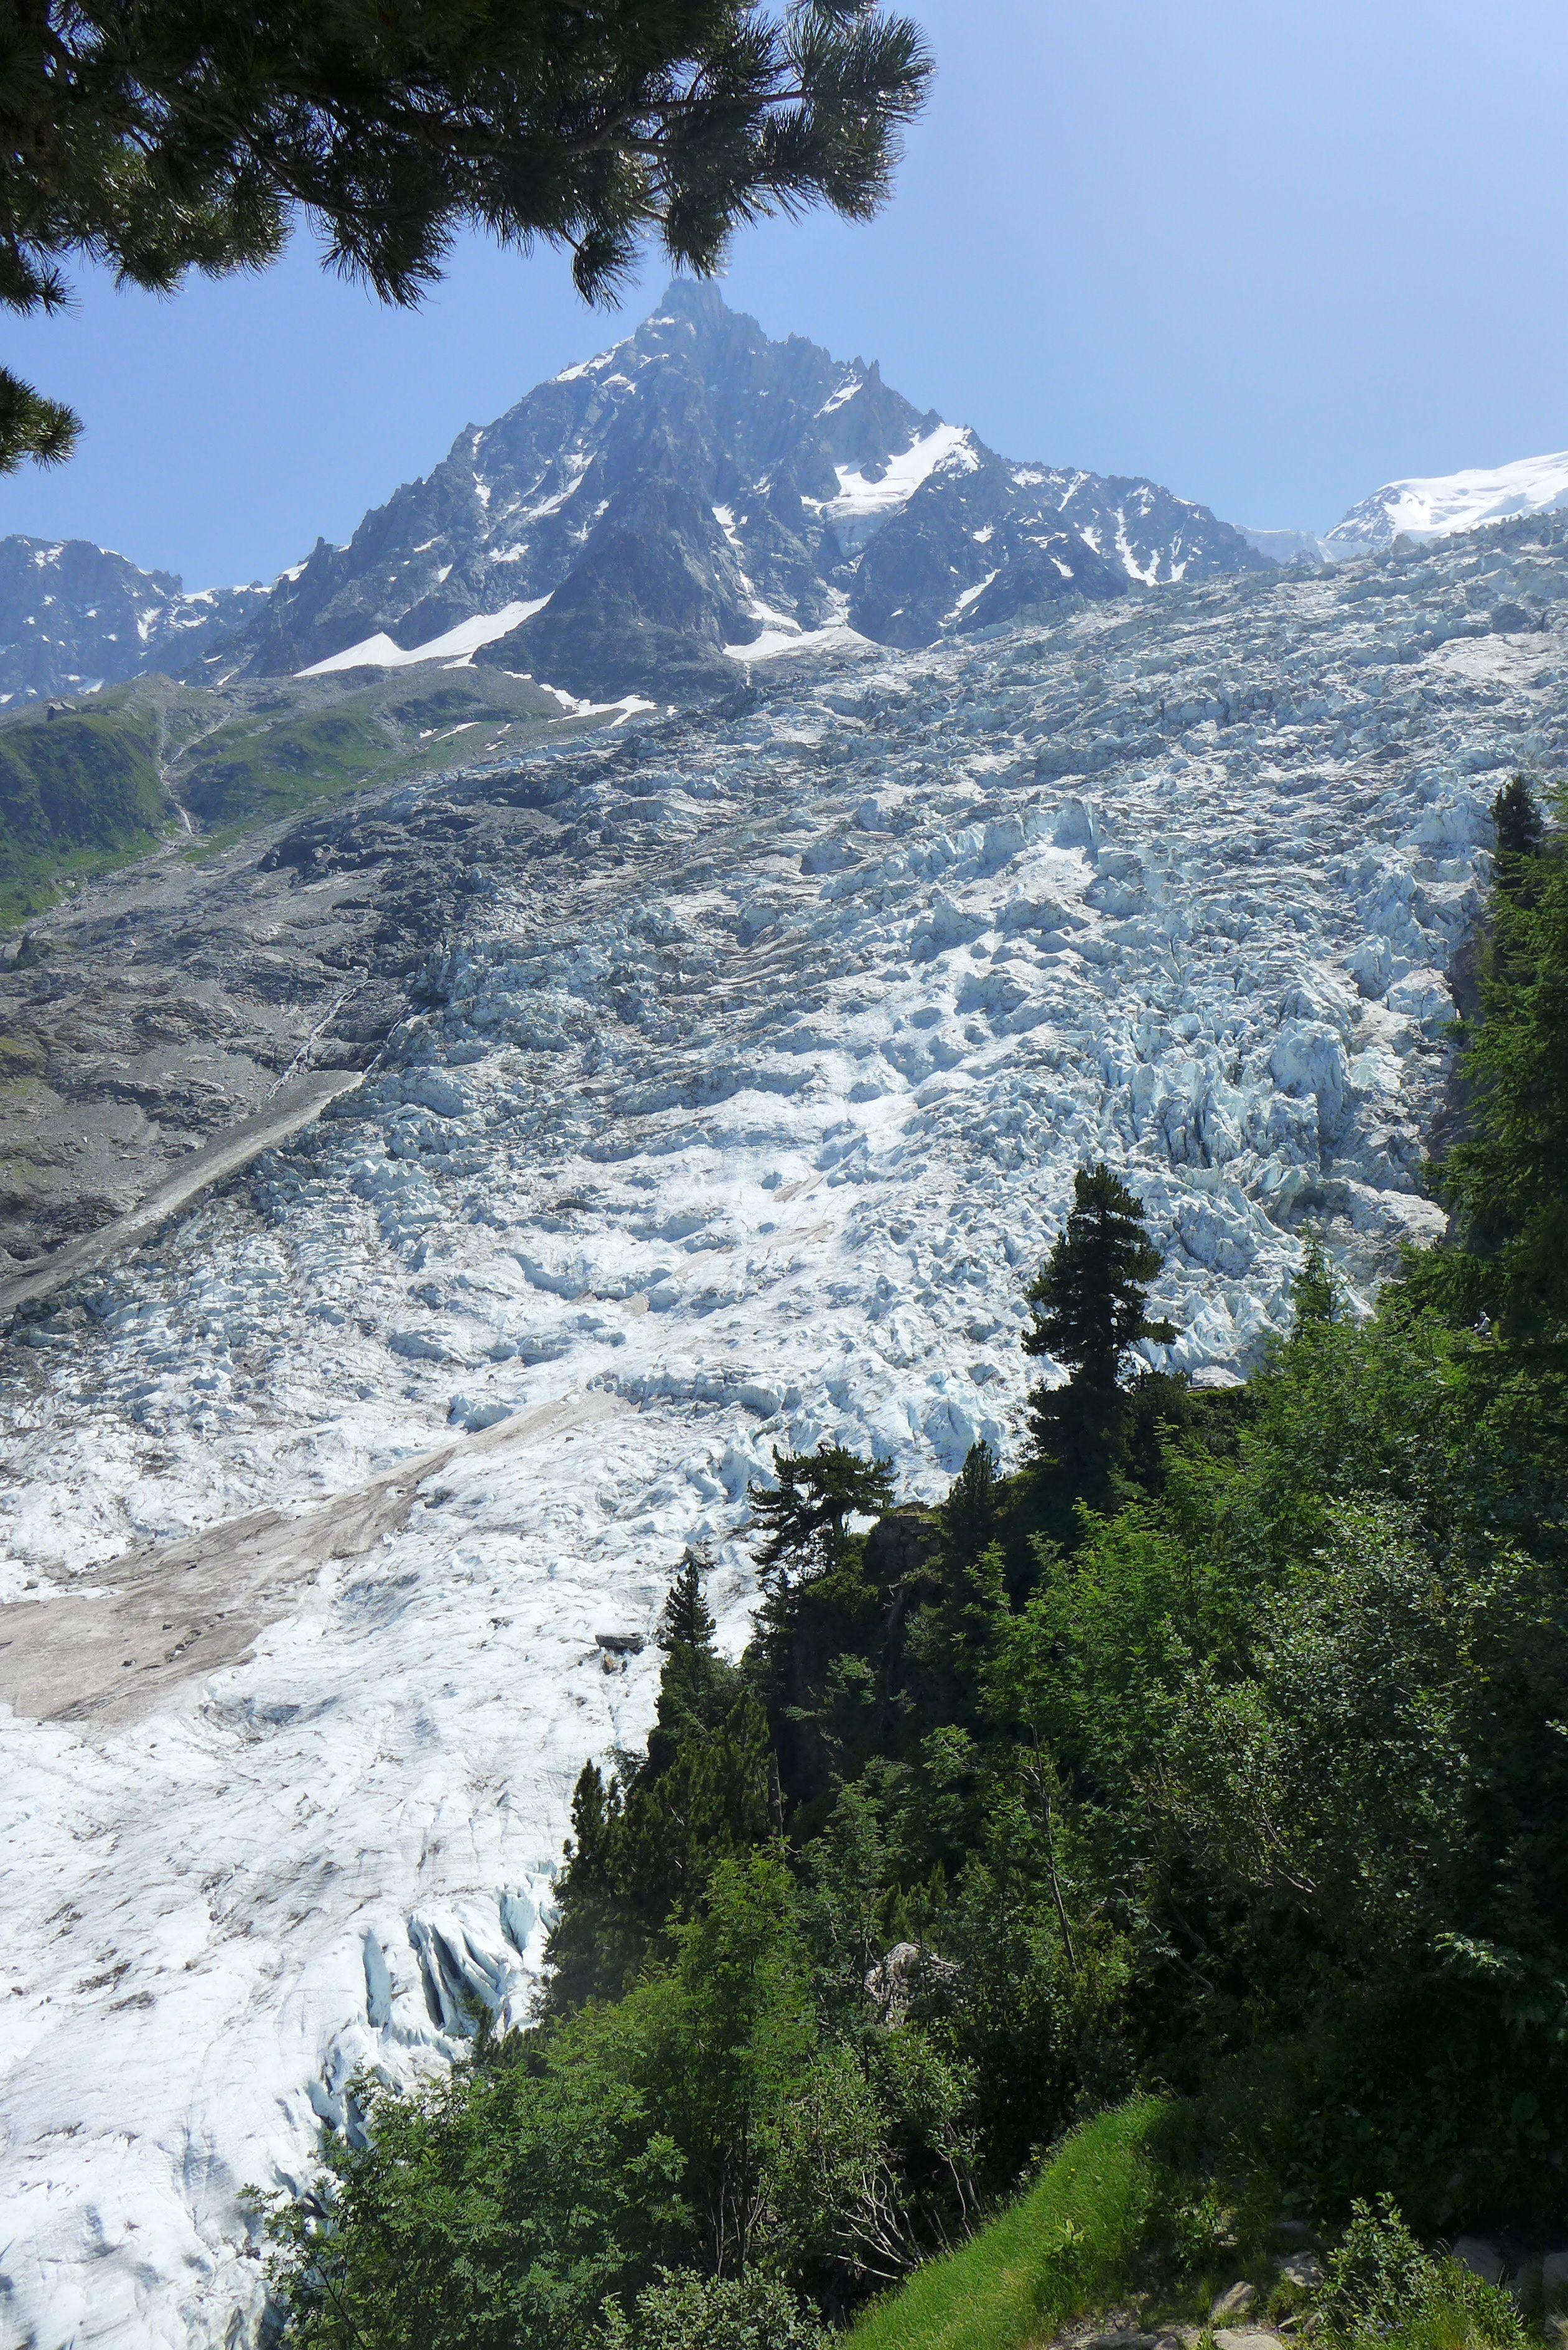 Glacier Bosson, Chamonix, France